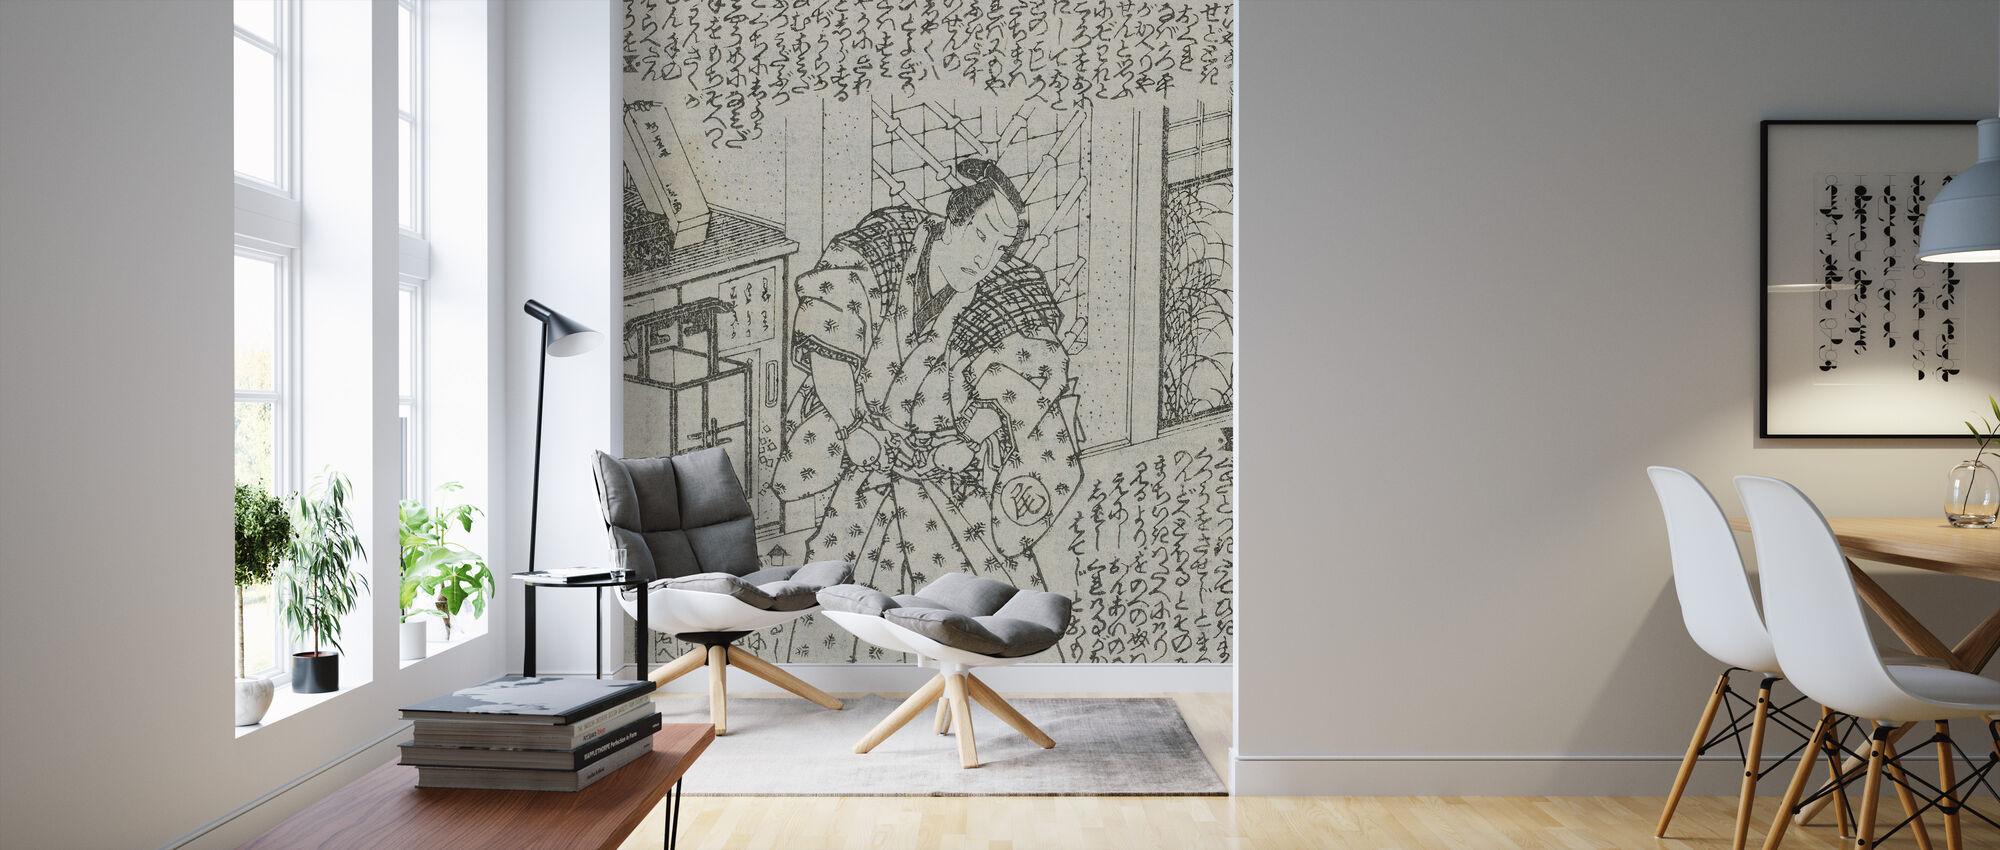 Novel Illustration - Utagawa Kunisada - Wallpaper - Living Room